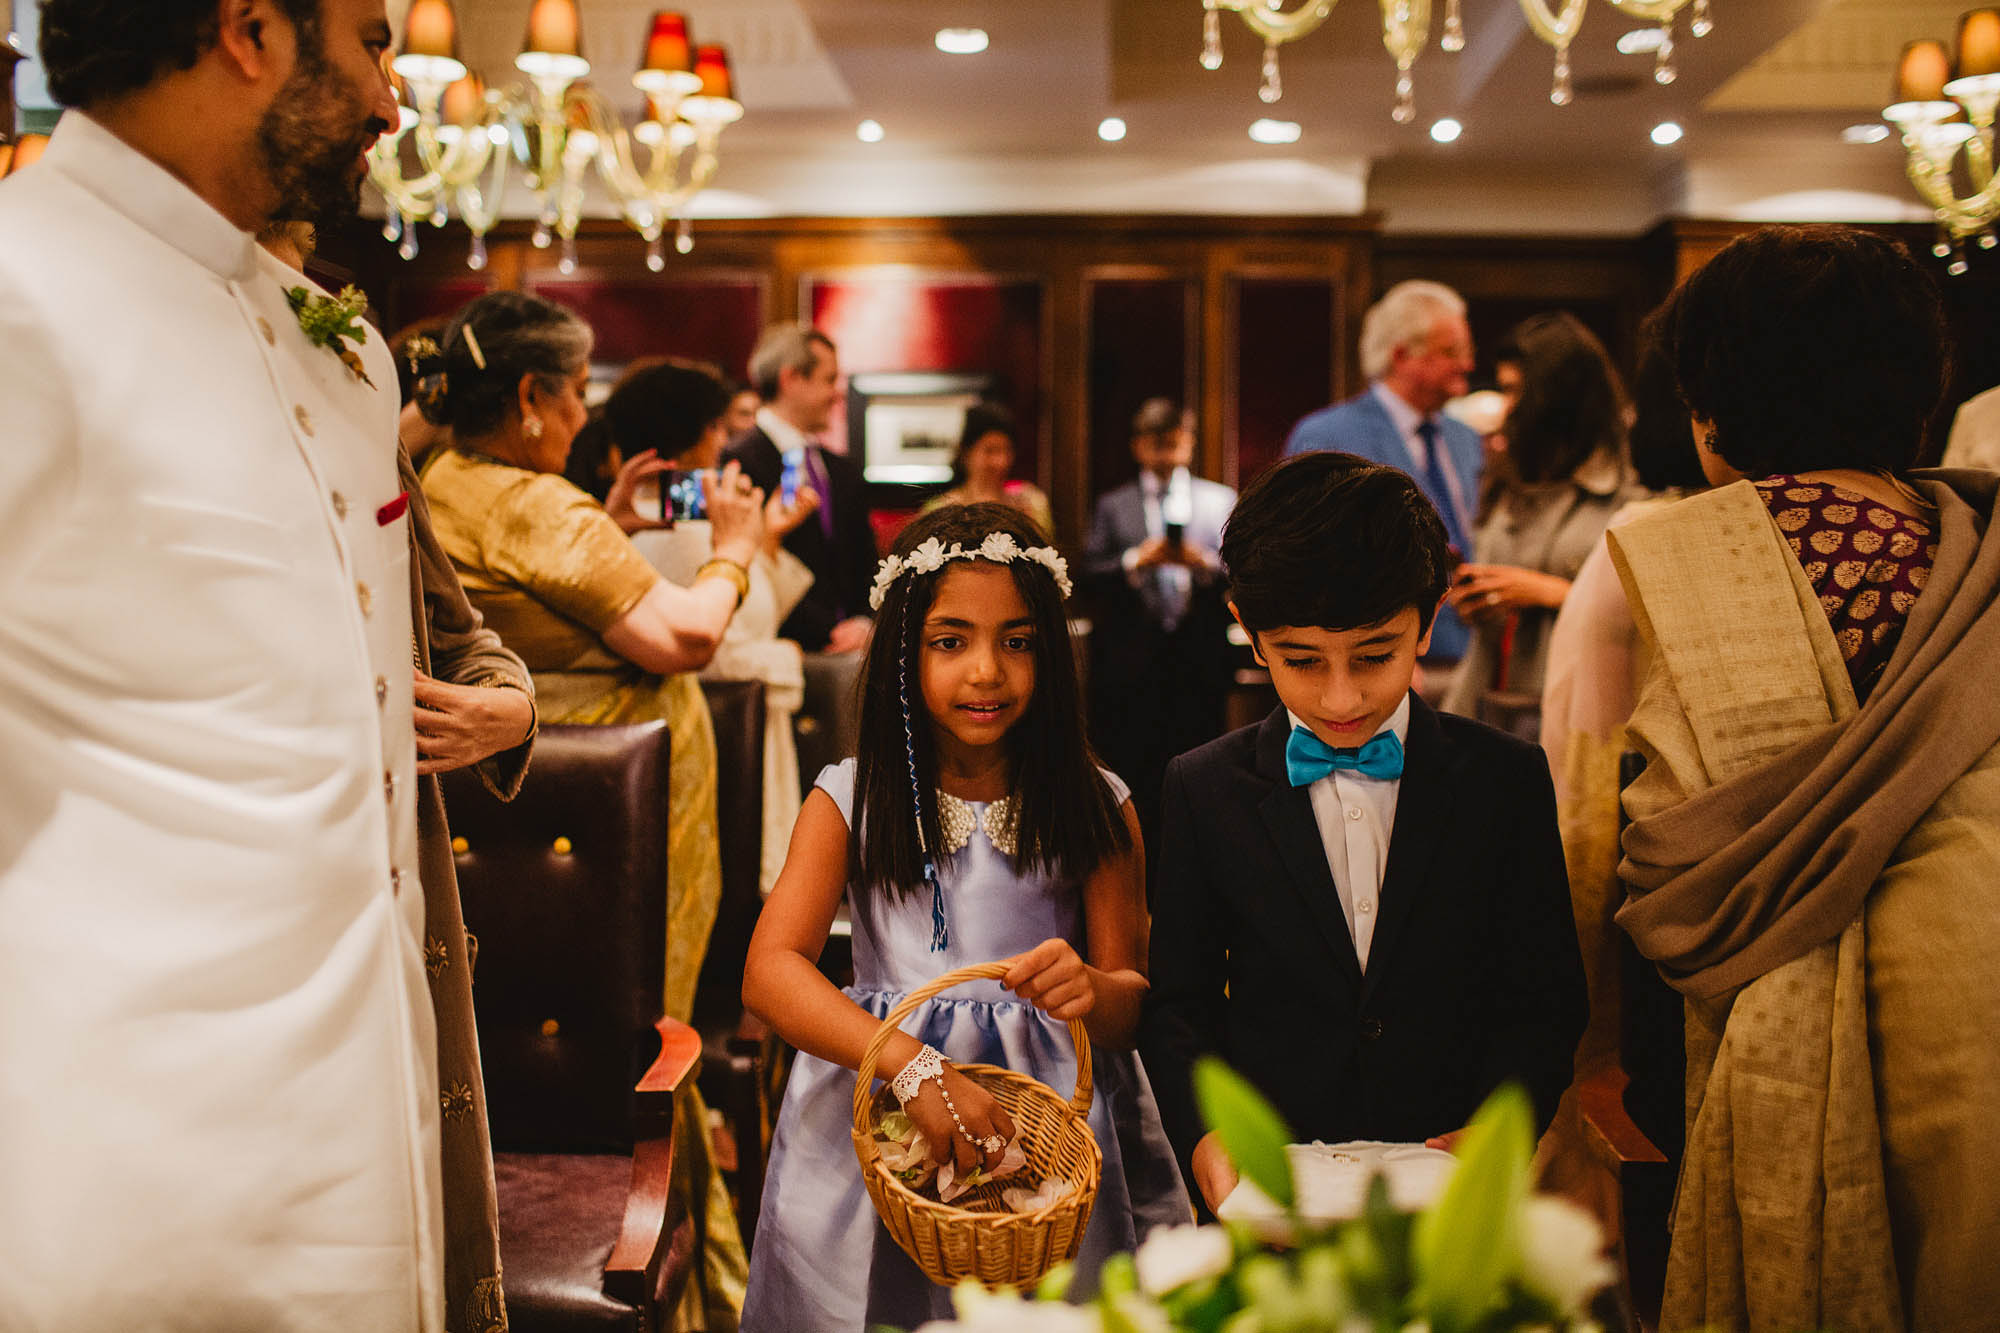 Goring hotel London wedding 13